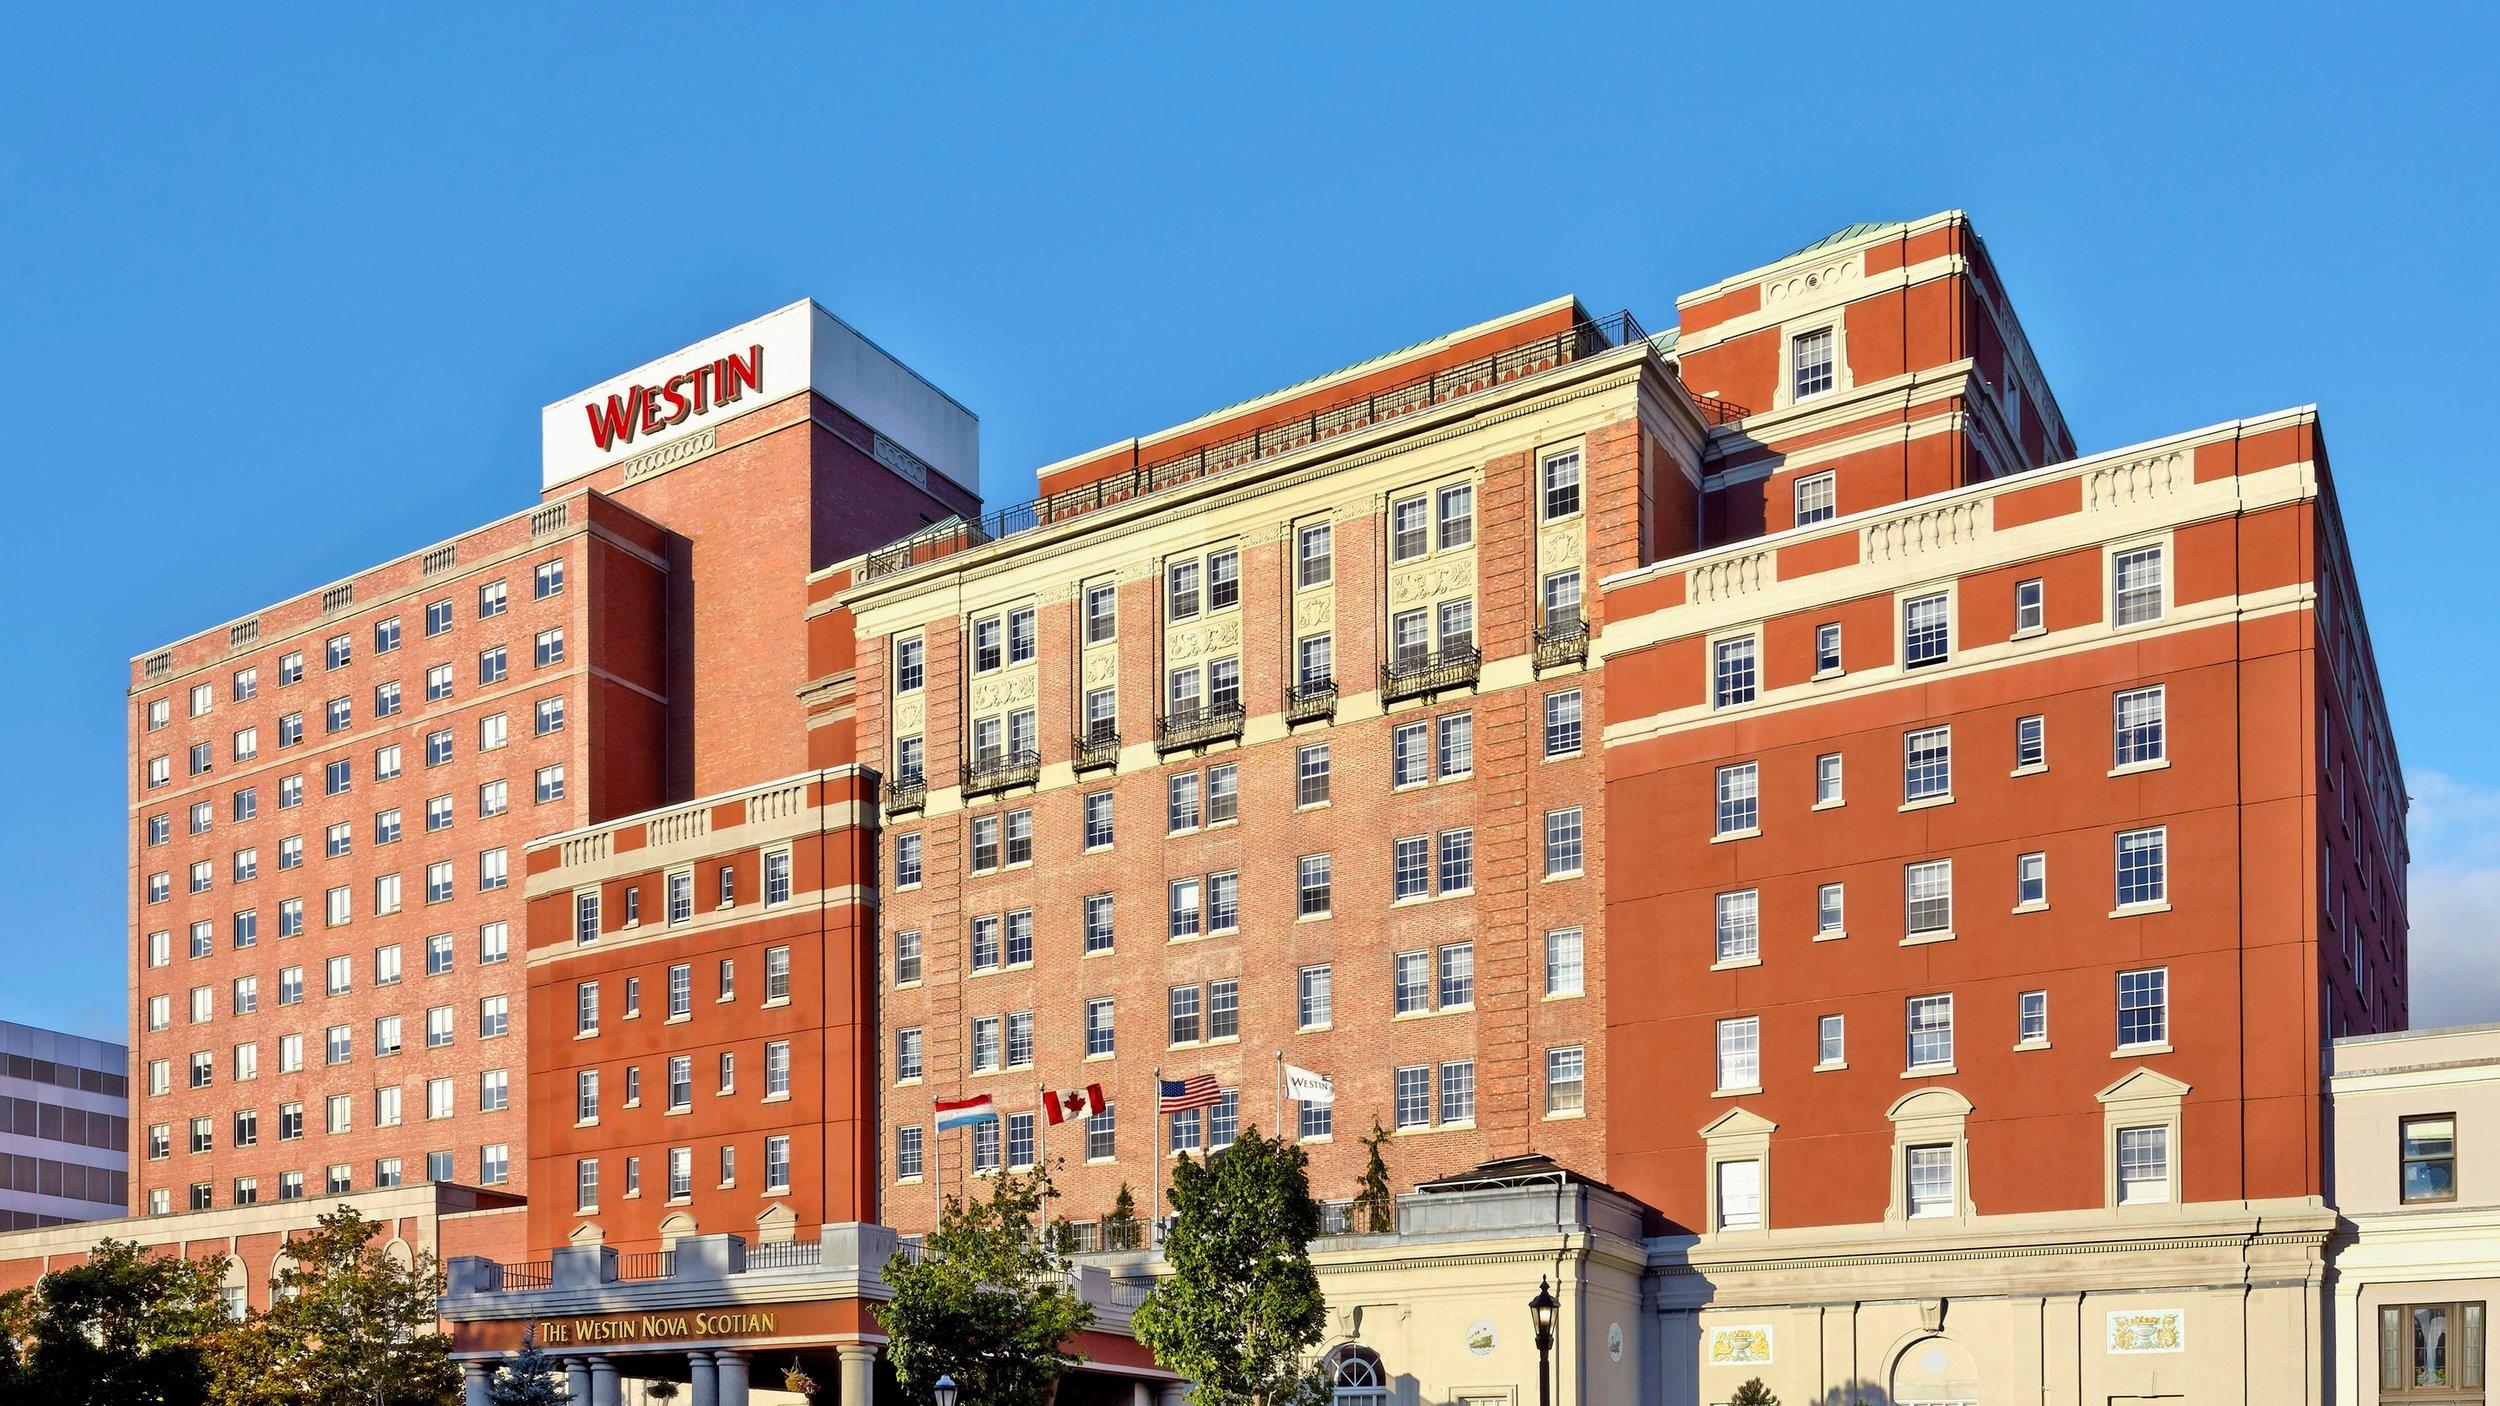 yhzwi-hotel-3686-hor-wide.jpg